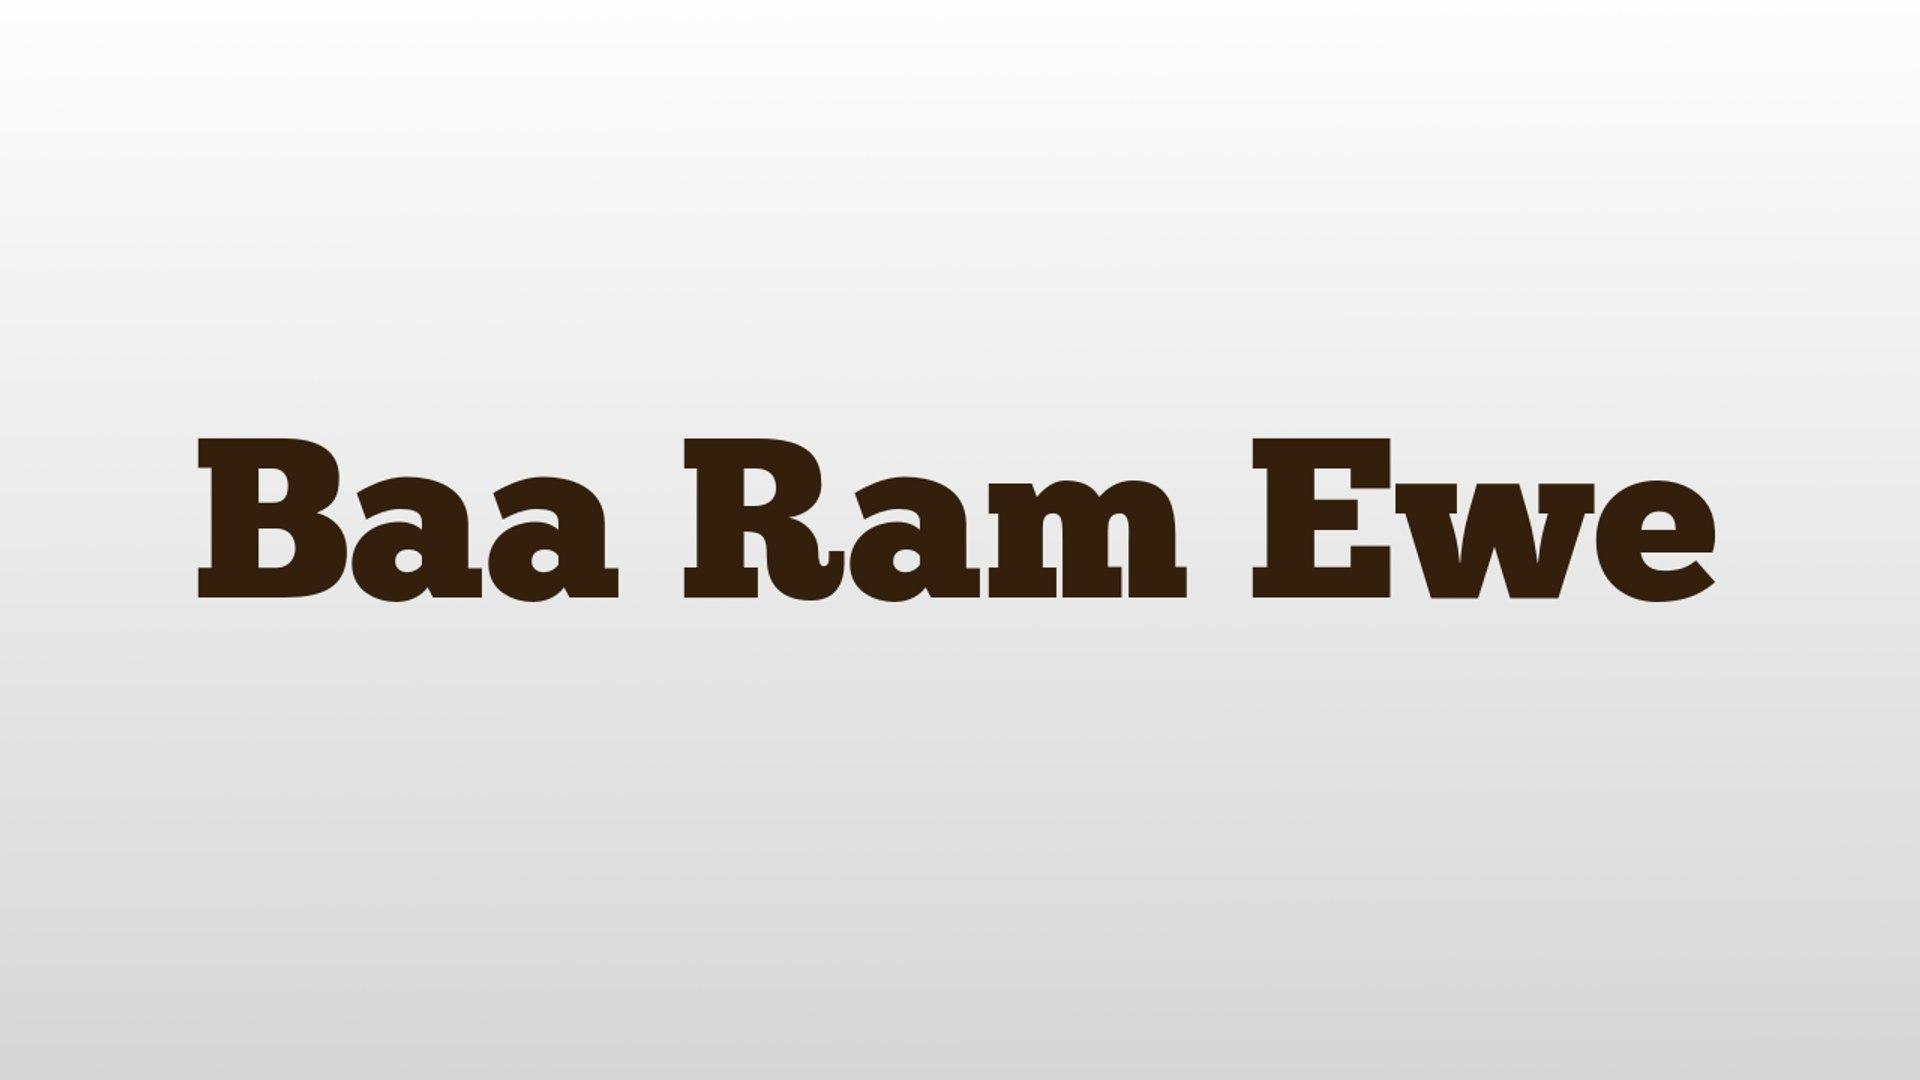 Baa Ram Ewe meaning and pronunciation - video dailymotion